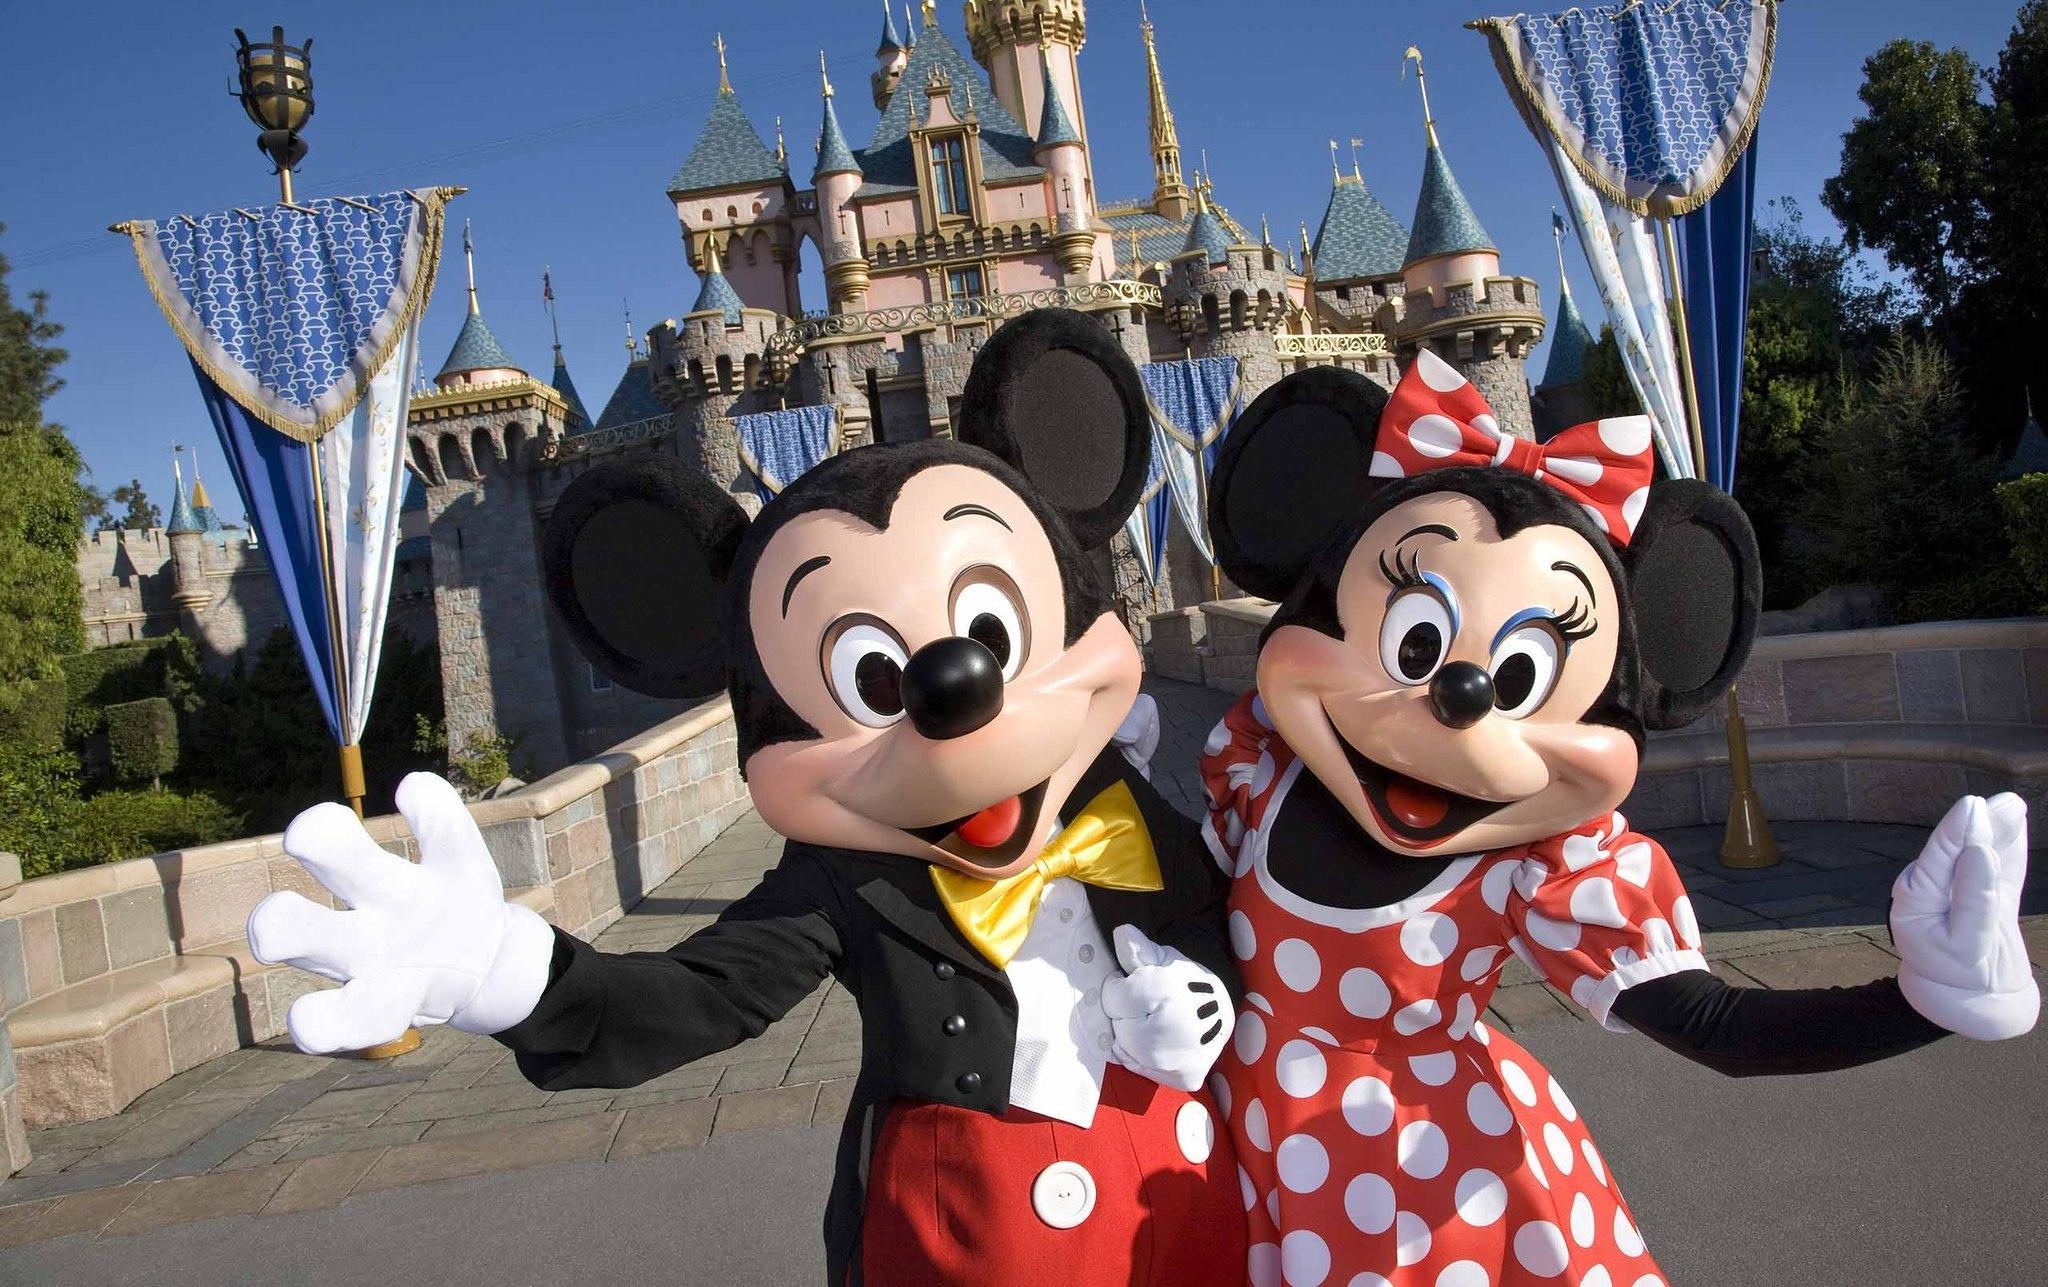 Disneyland -- Sleeping Beauty Castle